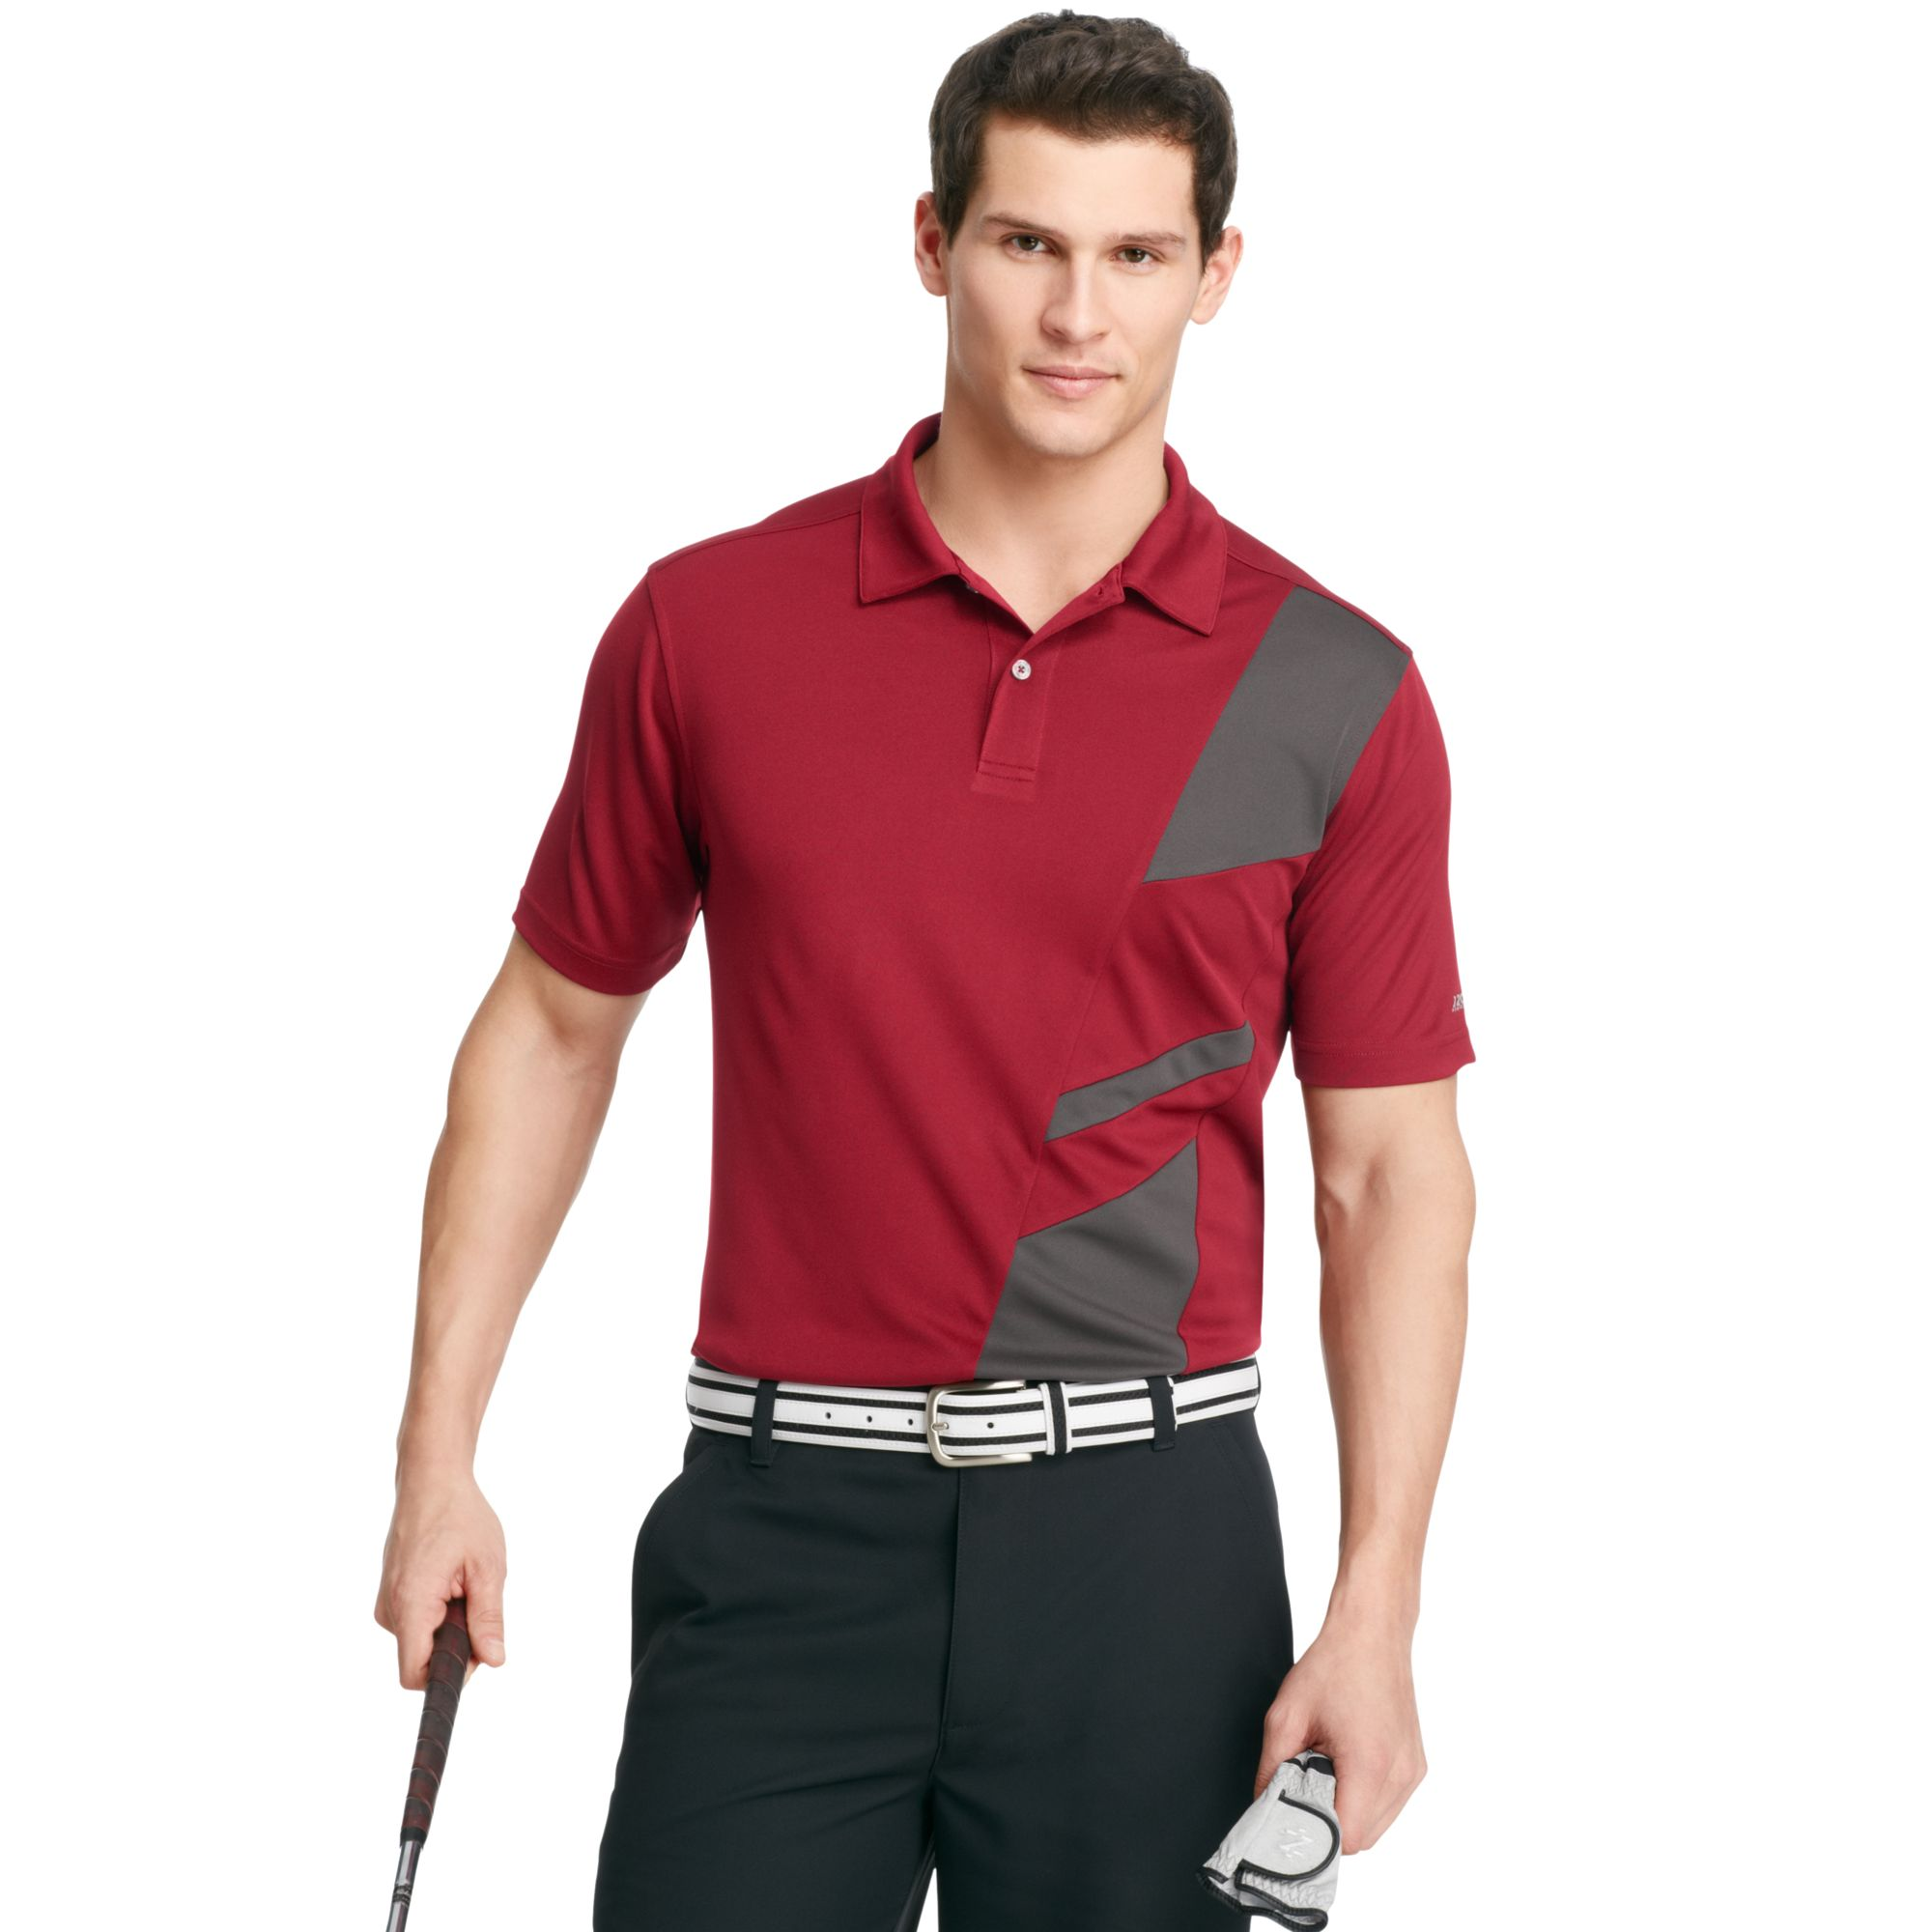 Izod Golf Shirt Shortsleeve Micro Pique Performance Polo ...